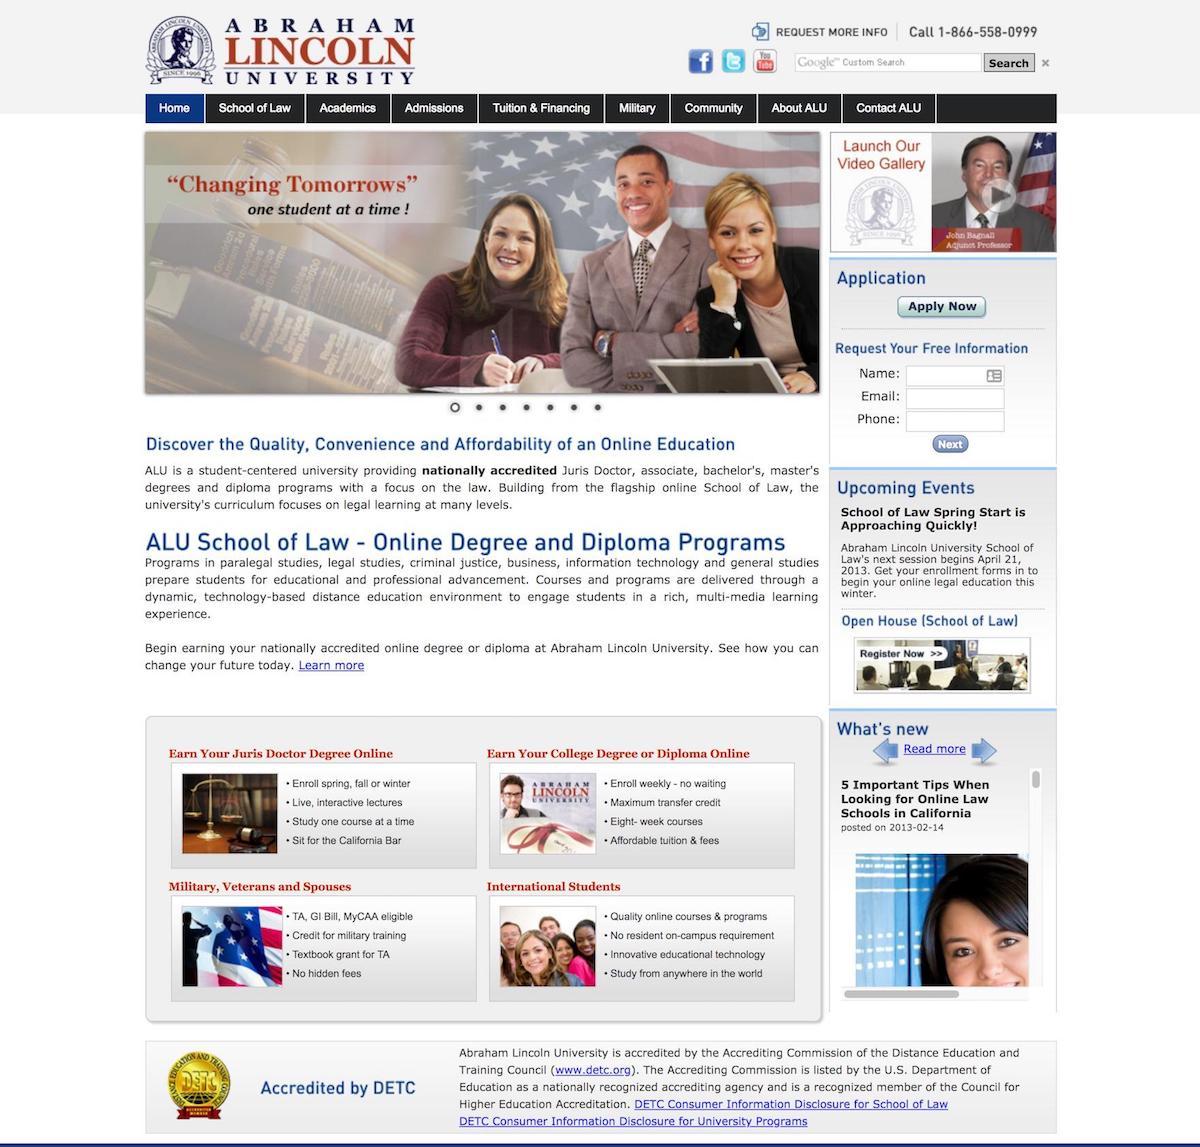 Website Design, User Experience Design, Digital Branding, Digital Marketing